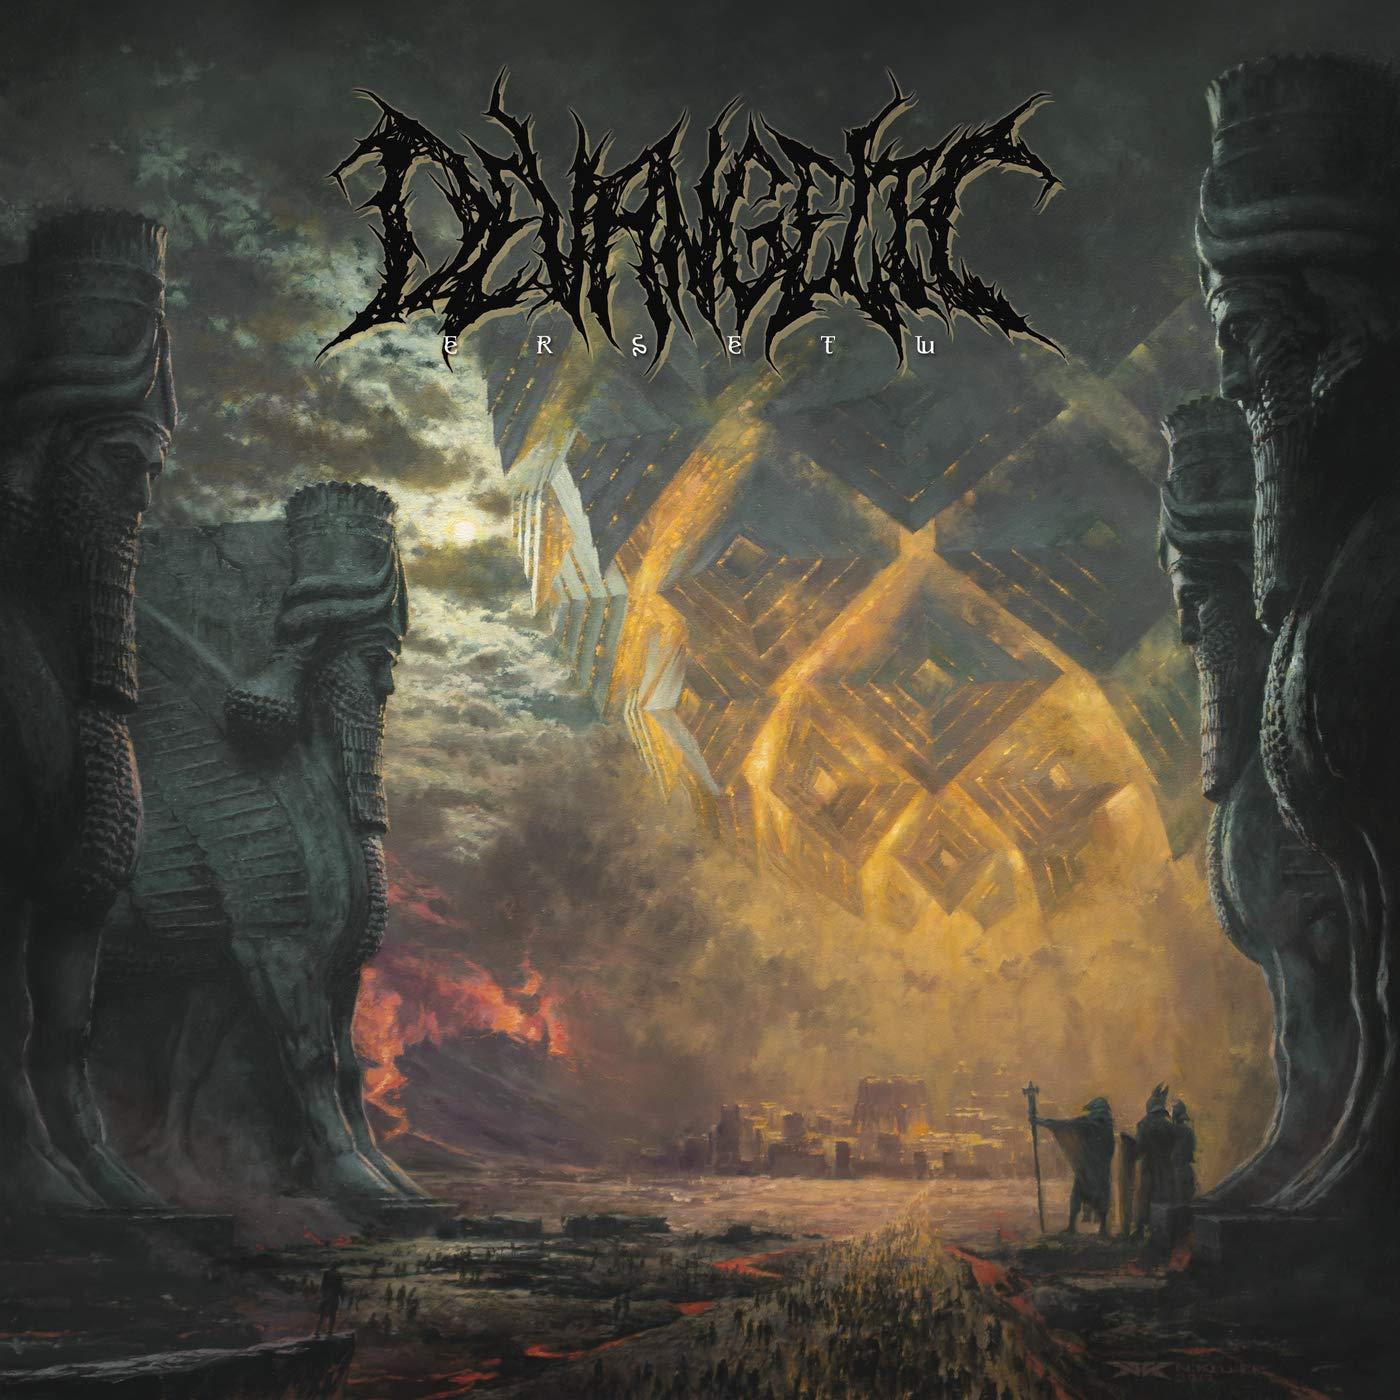 Devangelic - Ersetu (2020) [FLAC] Download